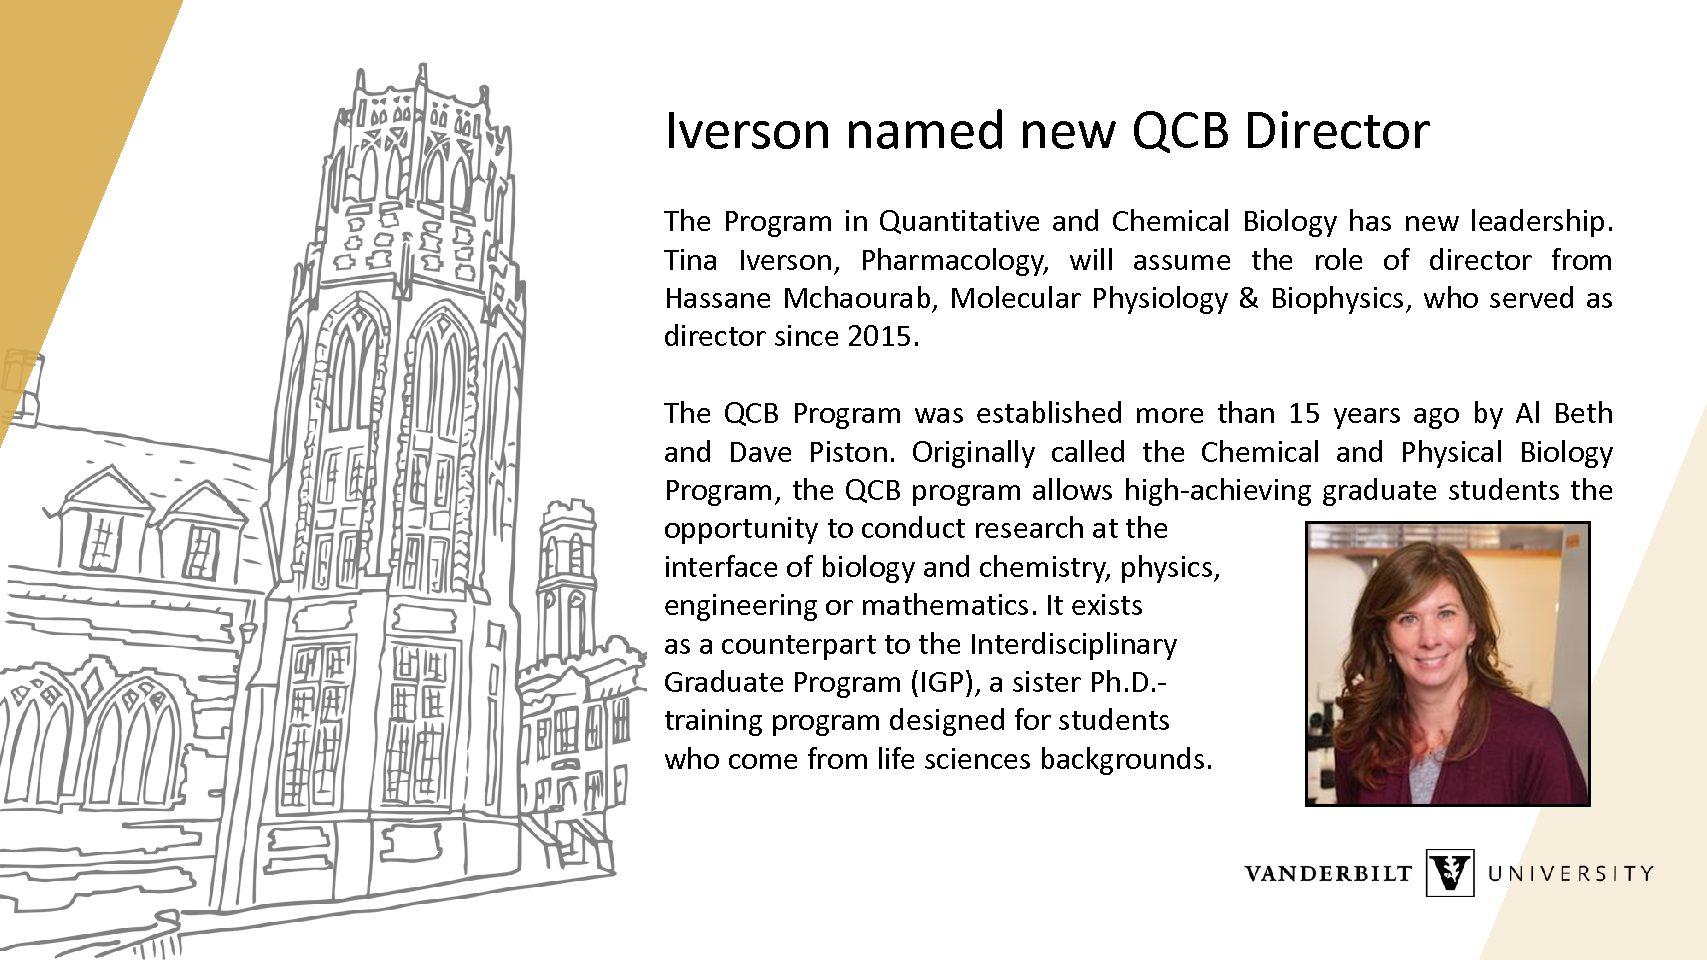 Iverson QCB Director